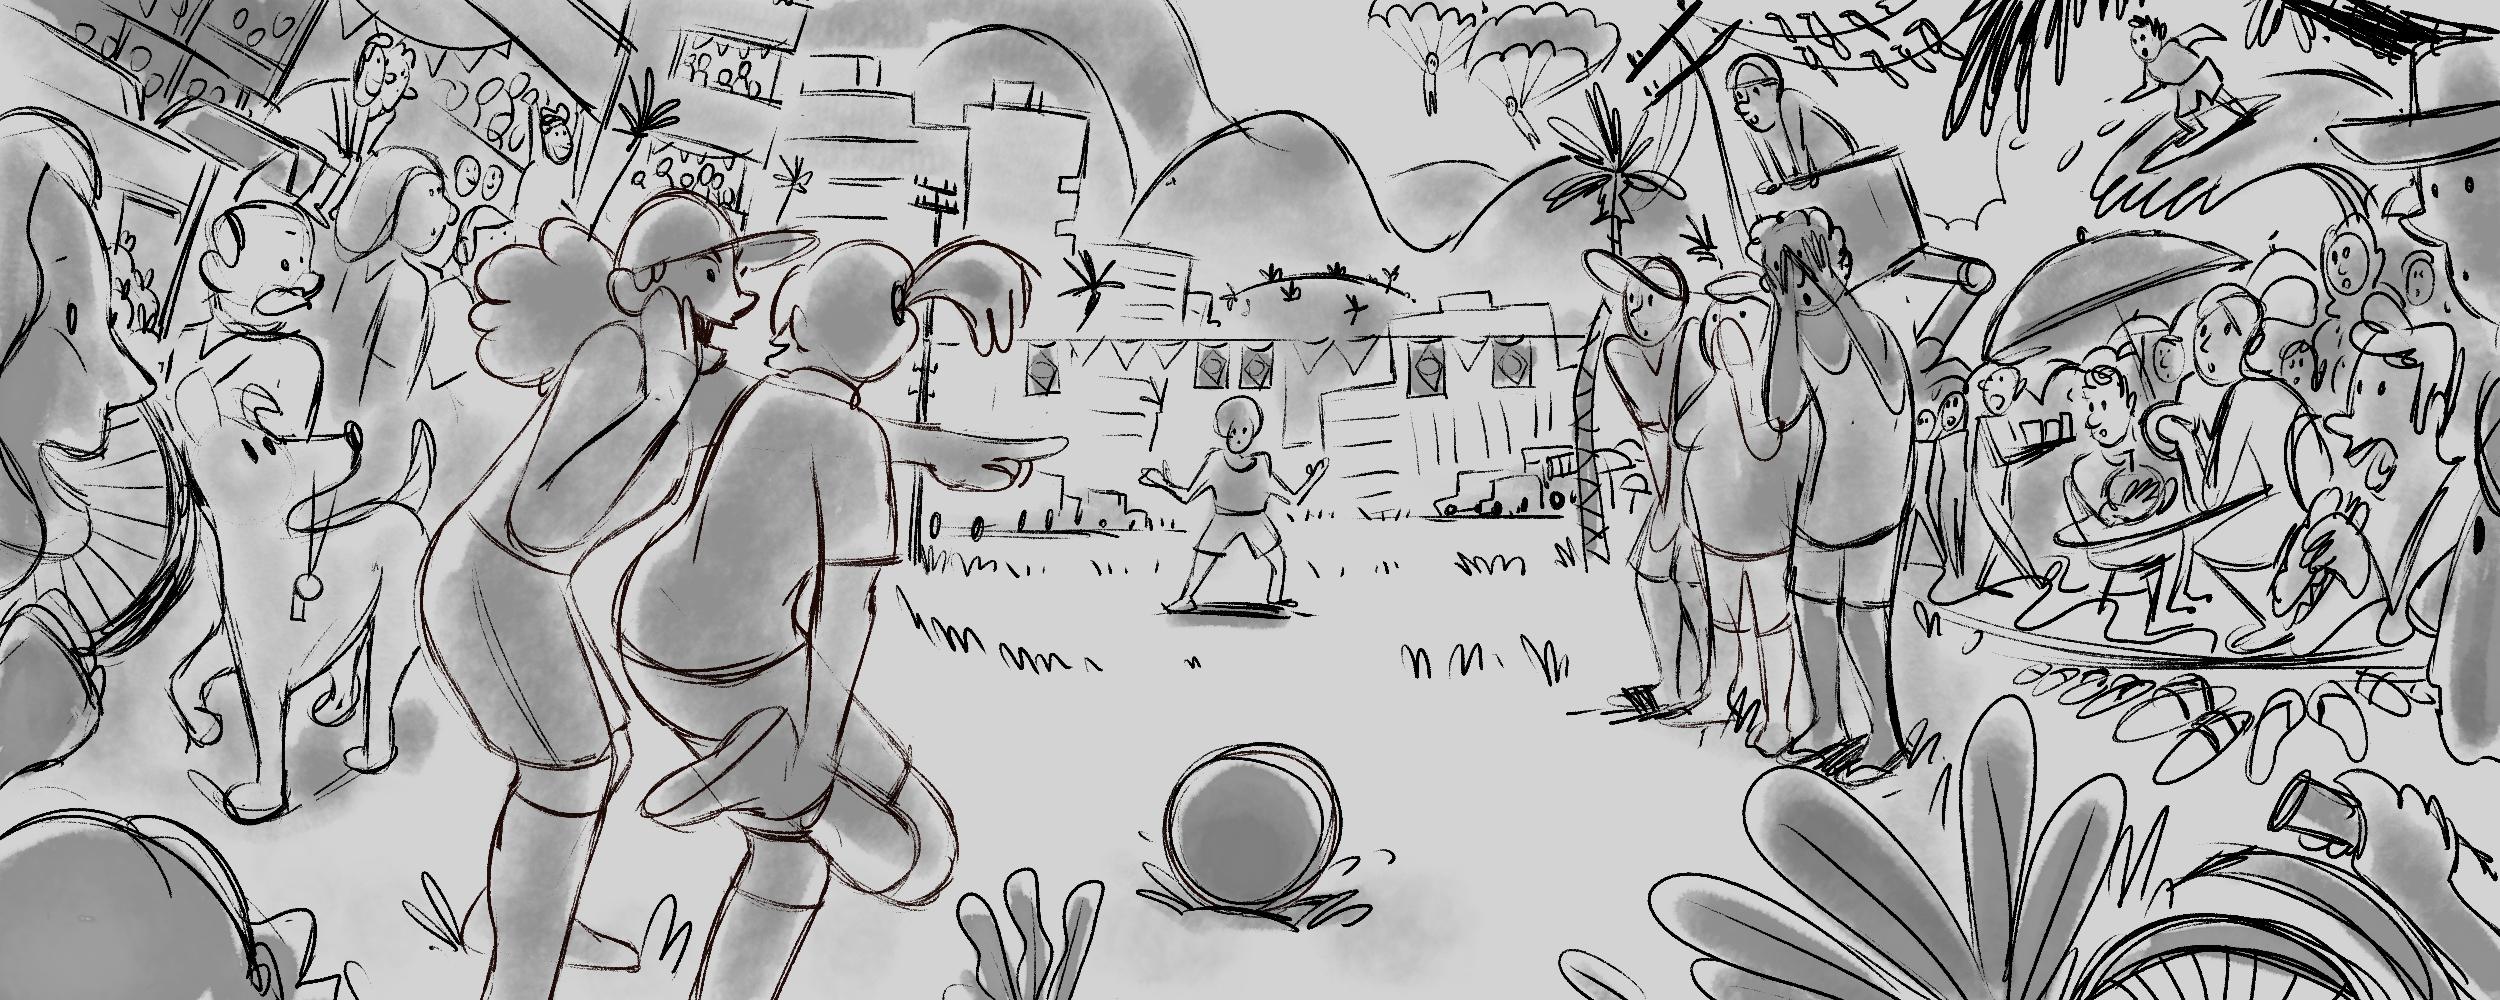 Brazil World Cup Doodle Sketch